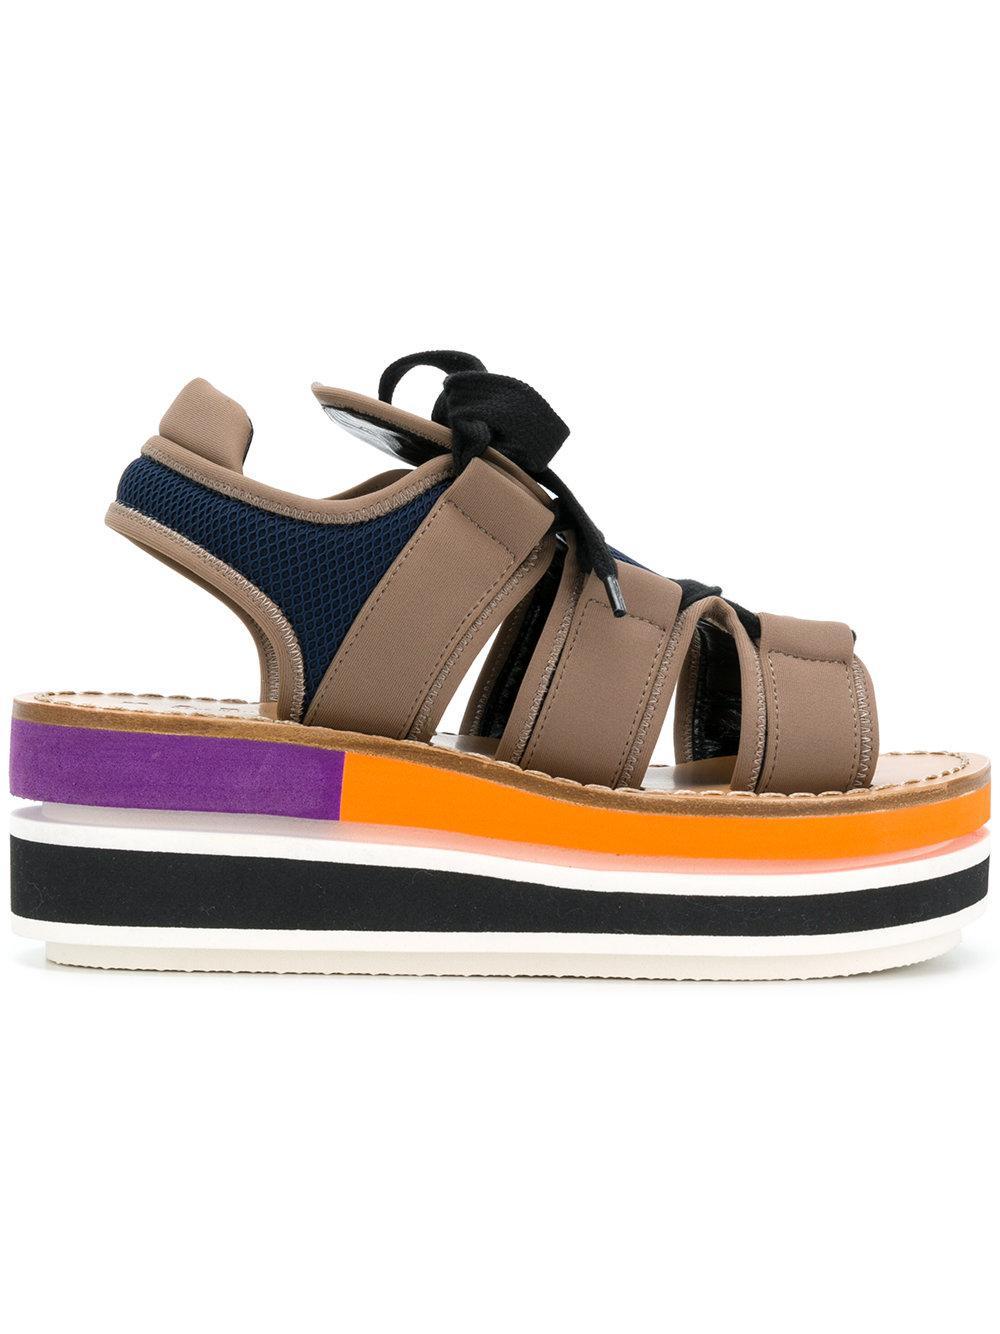 75f63d3f87a Marni Color-Block Platform Wedge Sandals In Black